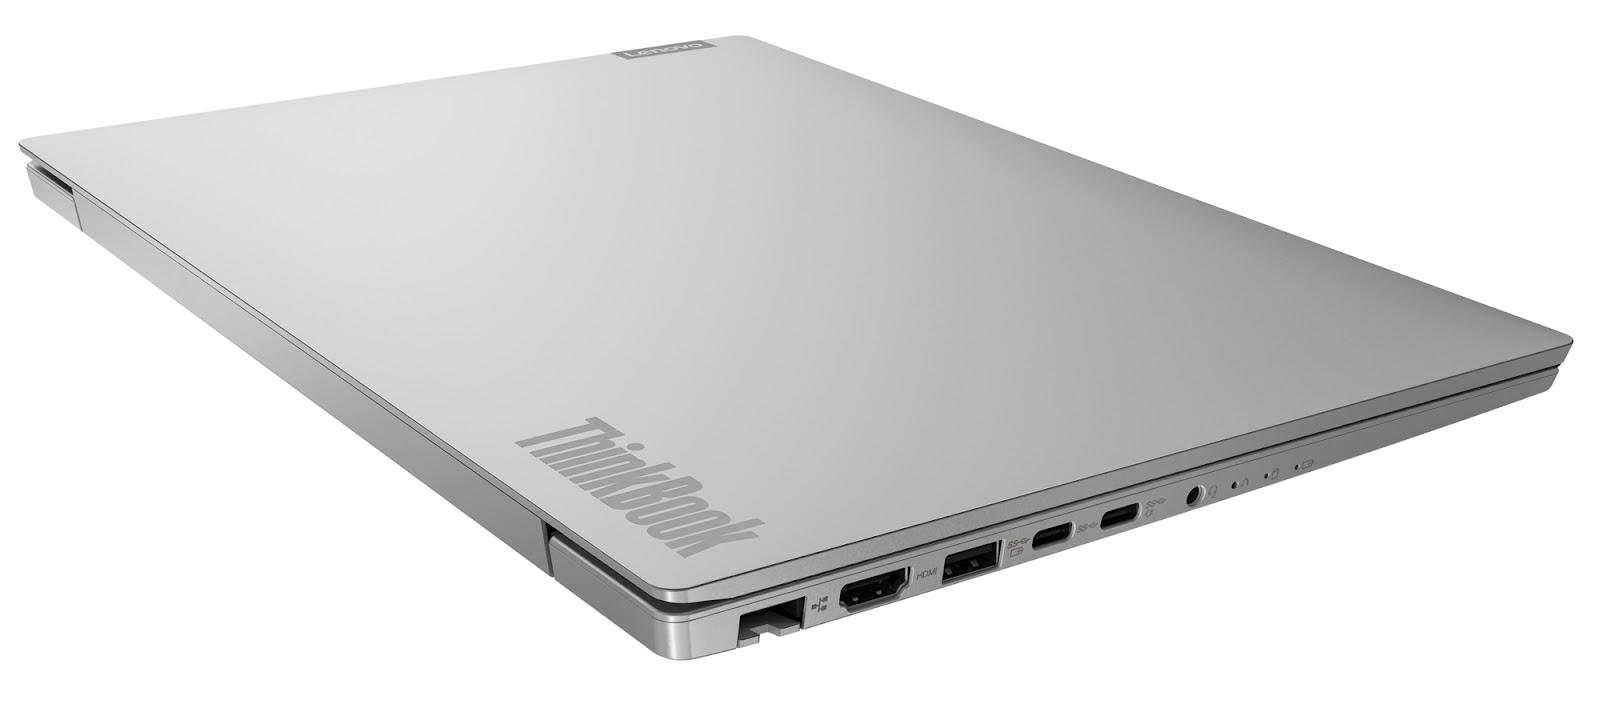 Фото 3. Ноутбук Lenovo ThinkBook 14 IIL (20SL0032RU)